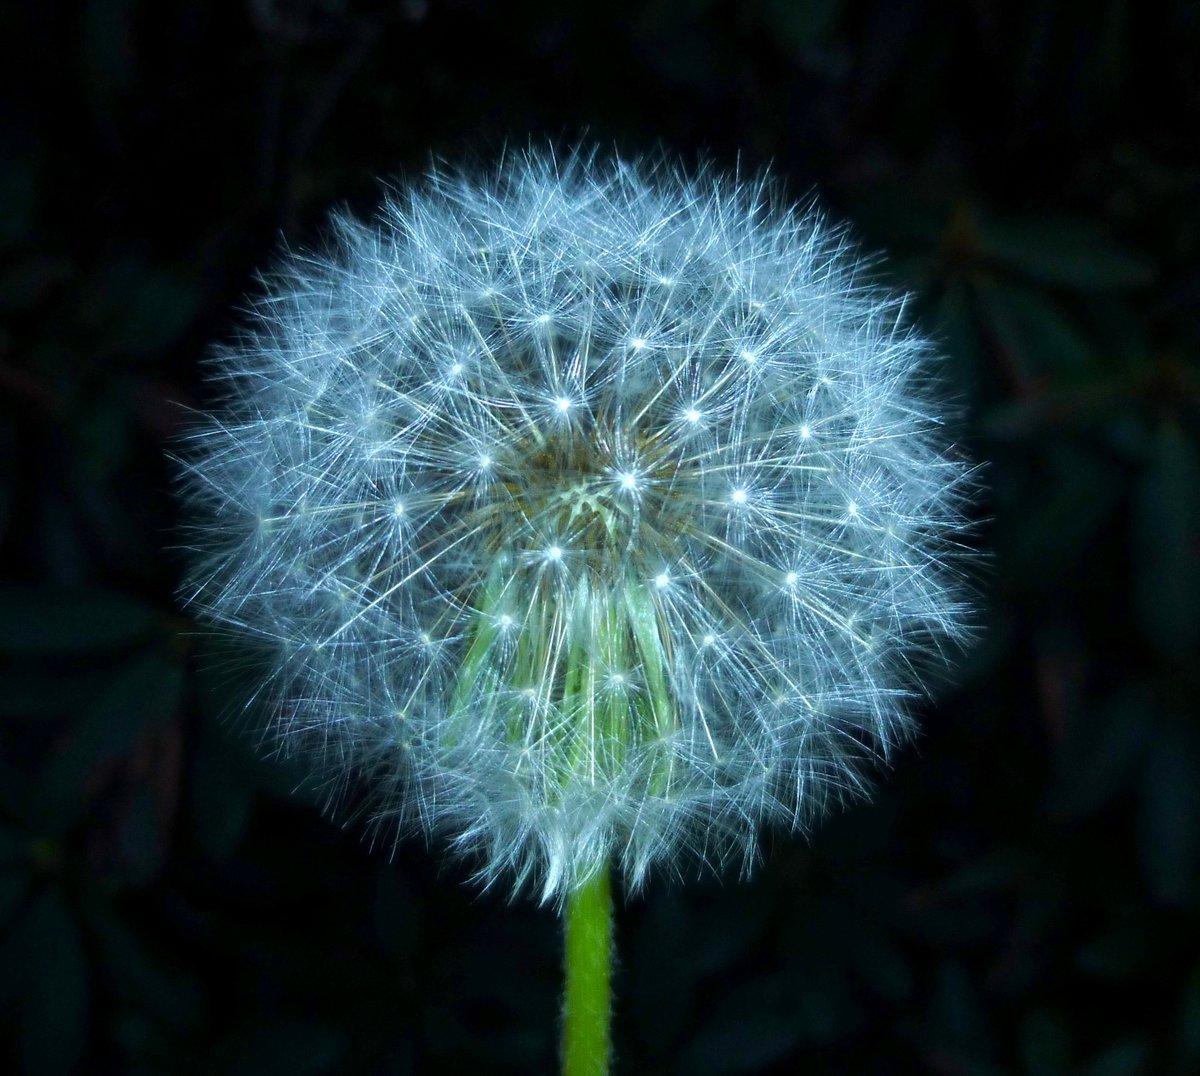 5. Dandelion Seed Head